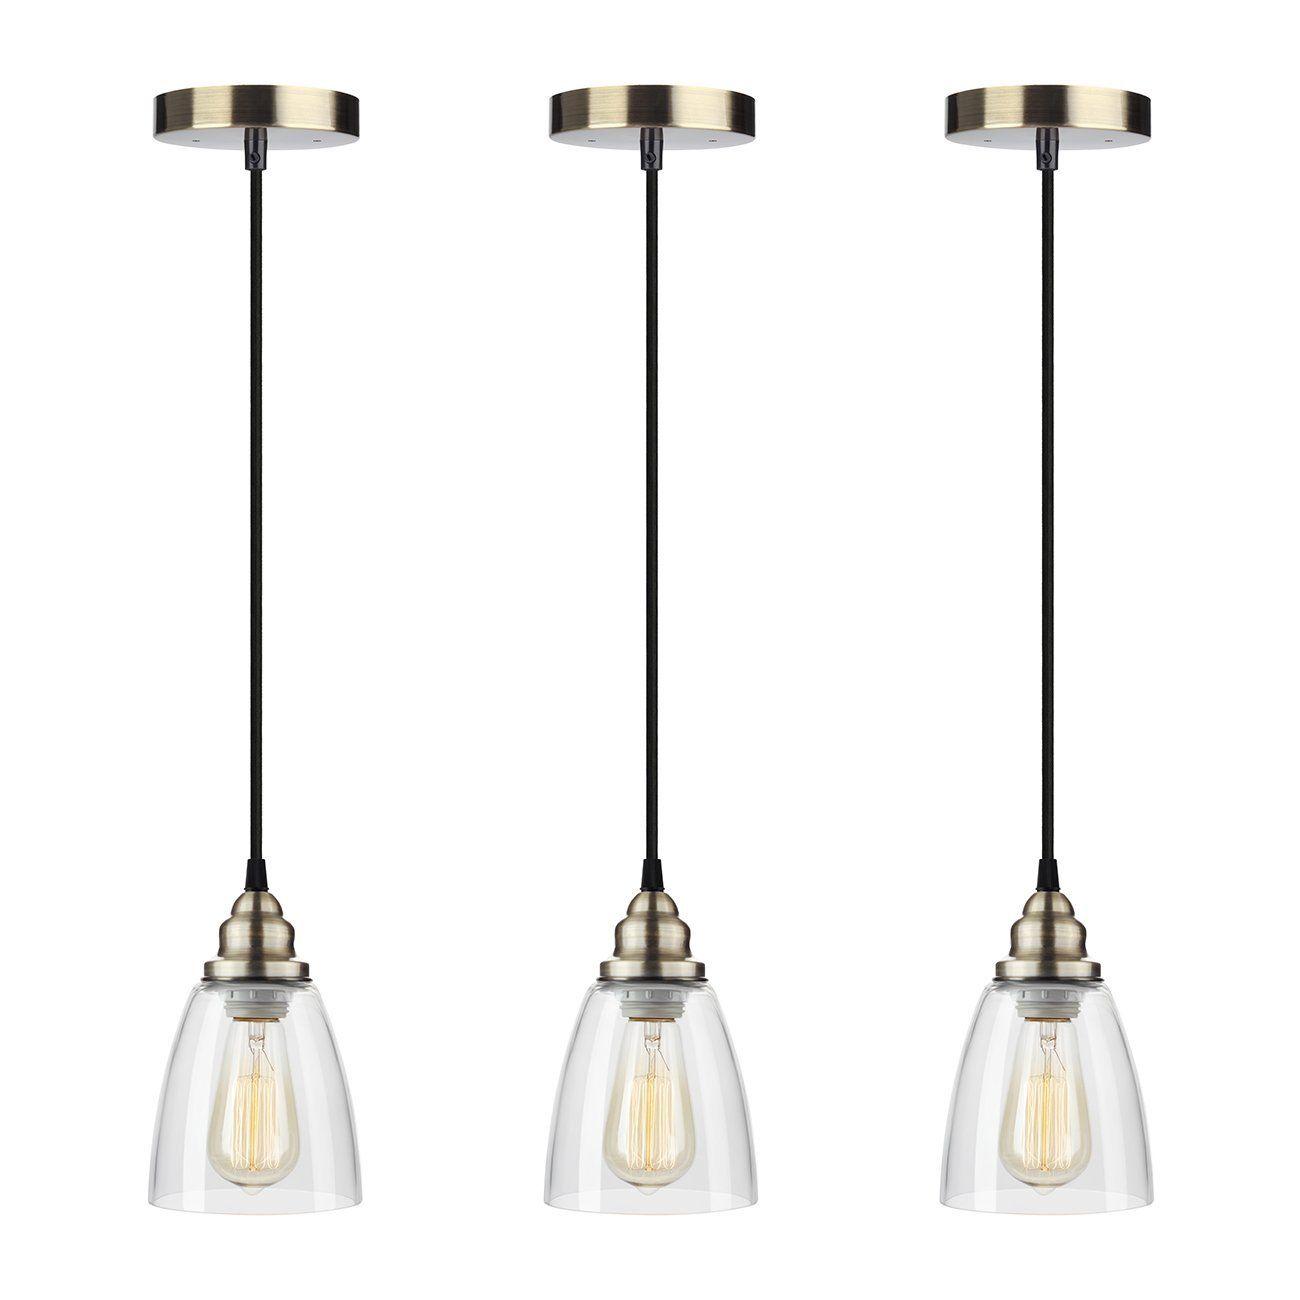 Industrial edison mini glass light pendant hanging lamp fixture